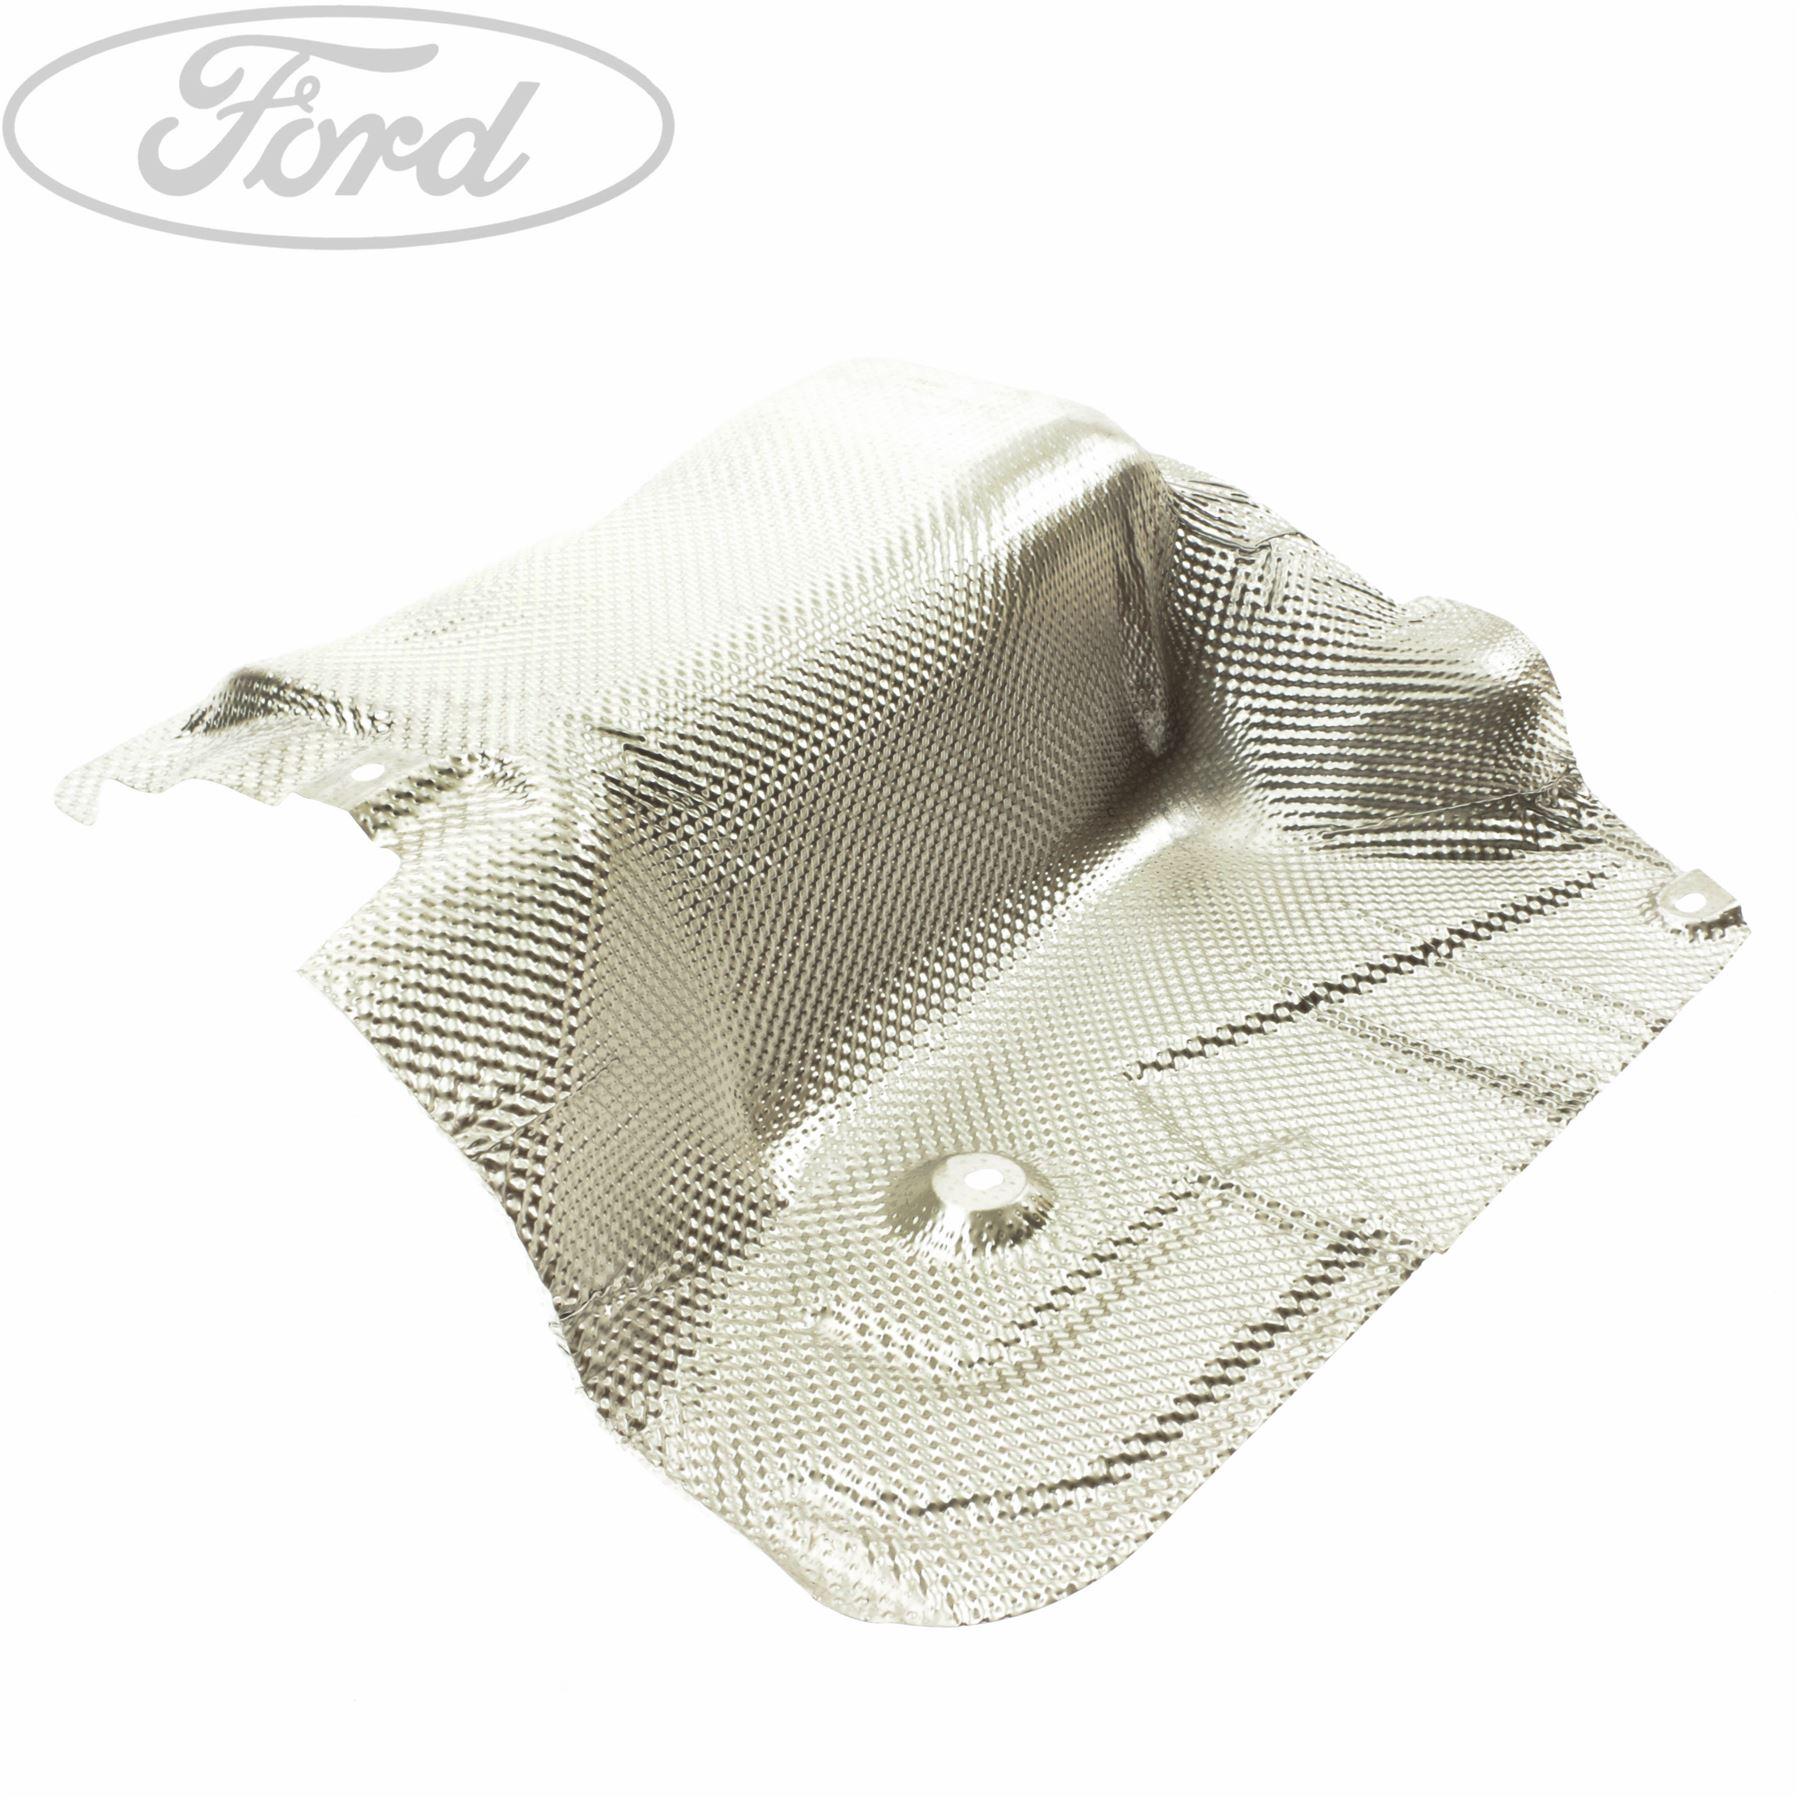 FORD FOCUS MK2 05-10 2007 1.6 PETROL EXHAUST MANIFOLD HEAT SHIELD 5M51-9N454-DA